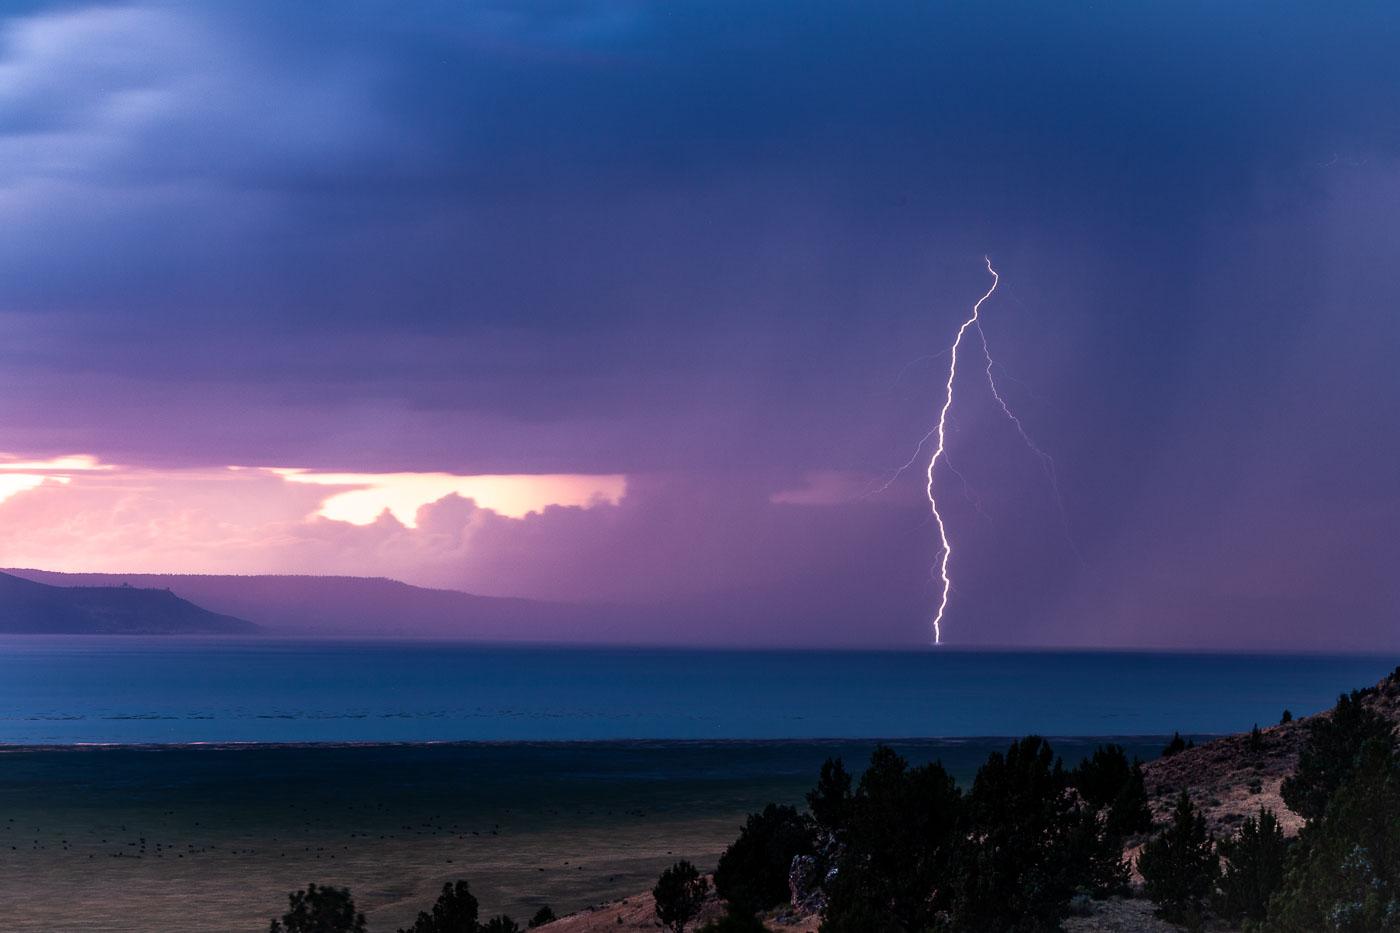 A lightning bolt strikes Goose Lake, California at sunset.